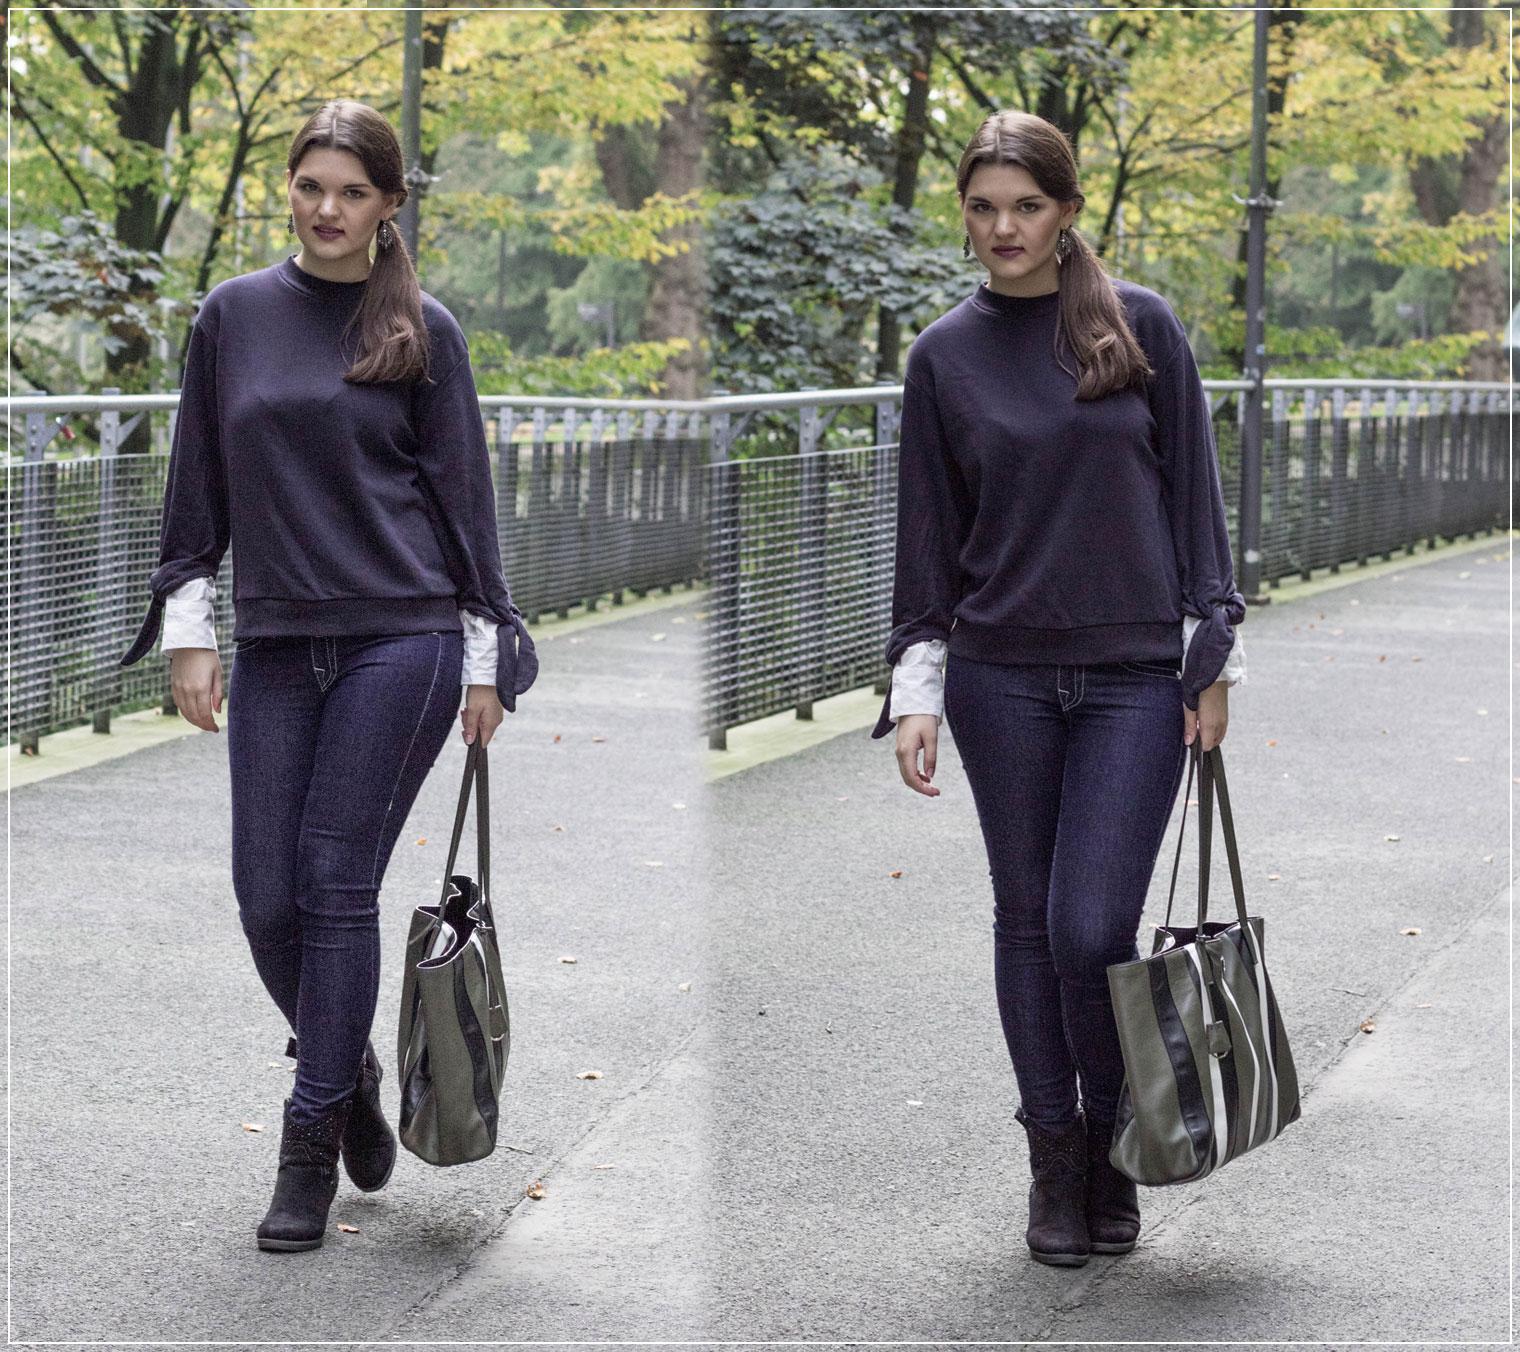 Sweater, Trendpiece, Herbstoutfit, Layering, Herbststyle, Modeblog, Ruhrgebiet, Modebloggerin, Fashionblog, Modeblog